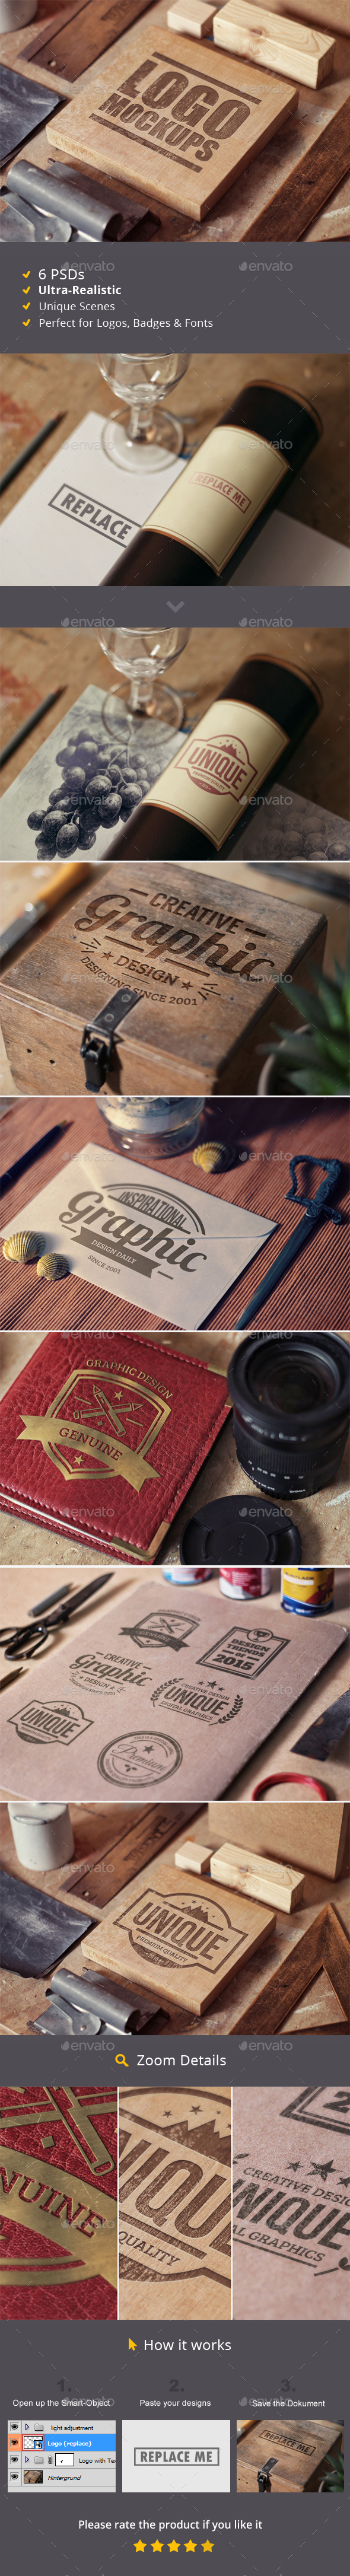 Perspective Logo Mockups - Logo Product Mock-Ups